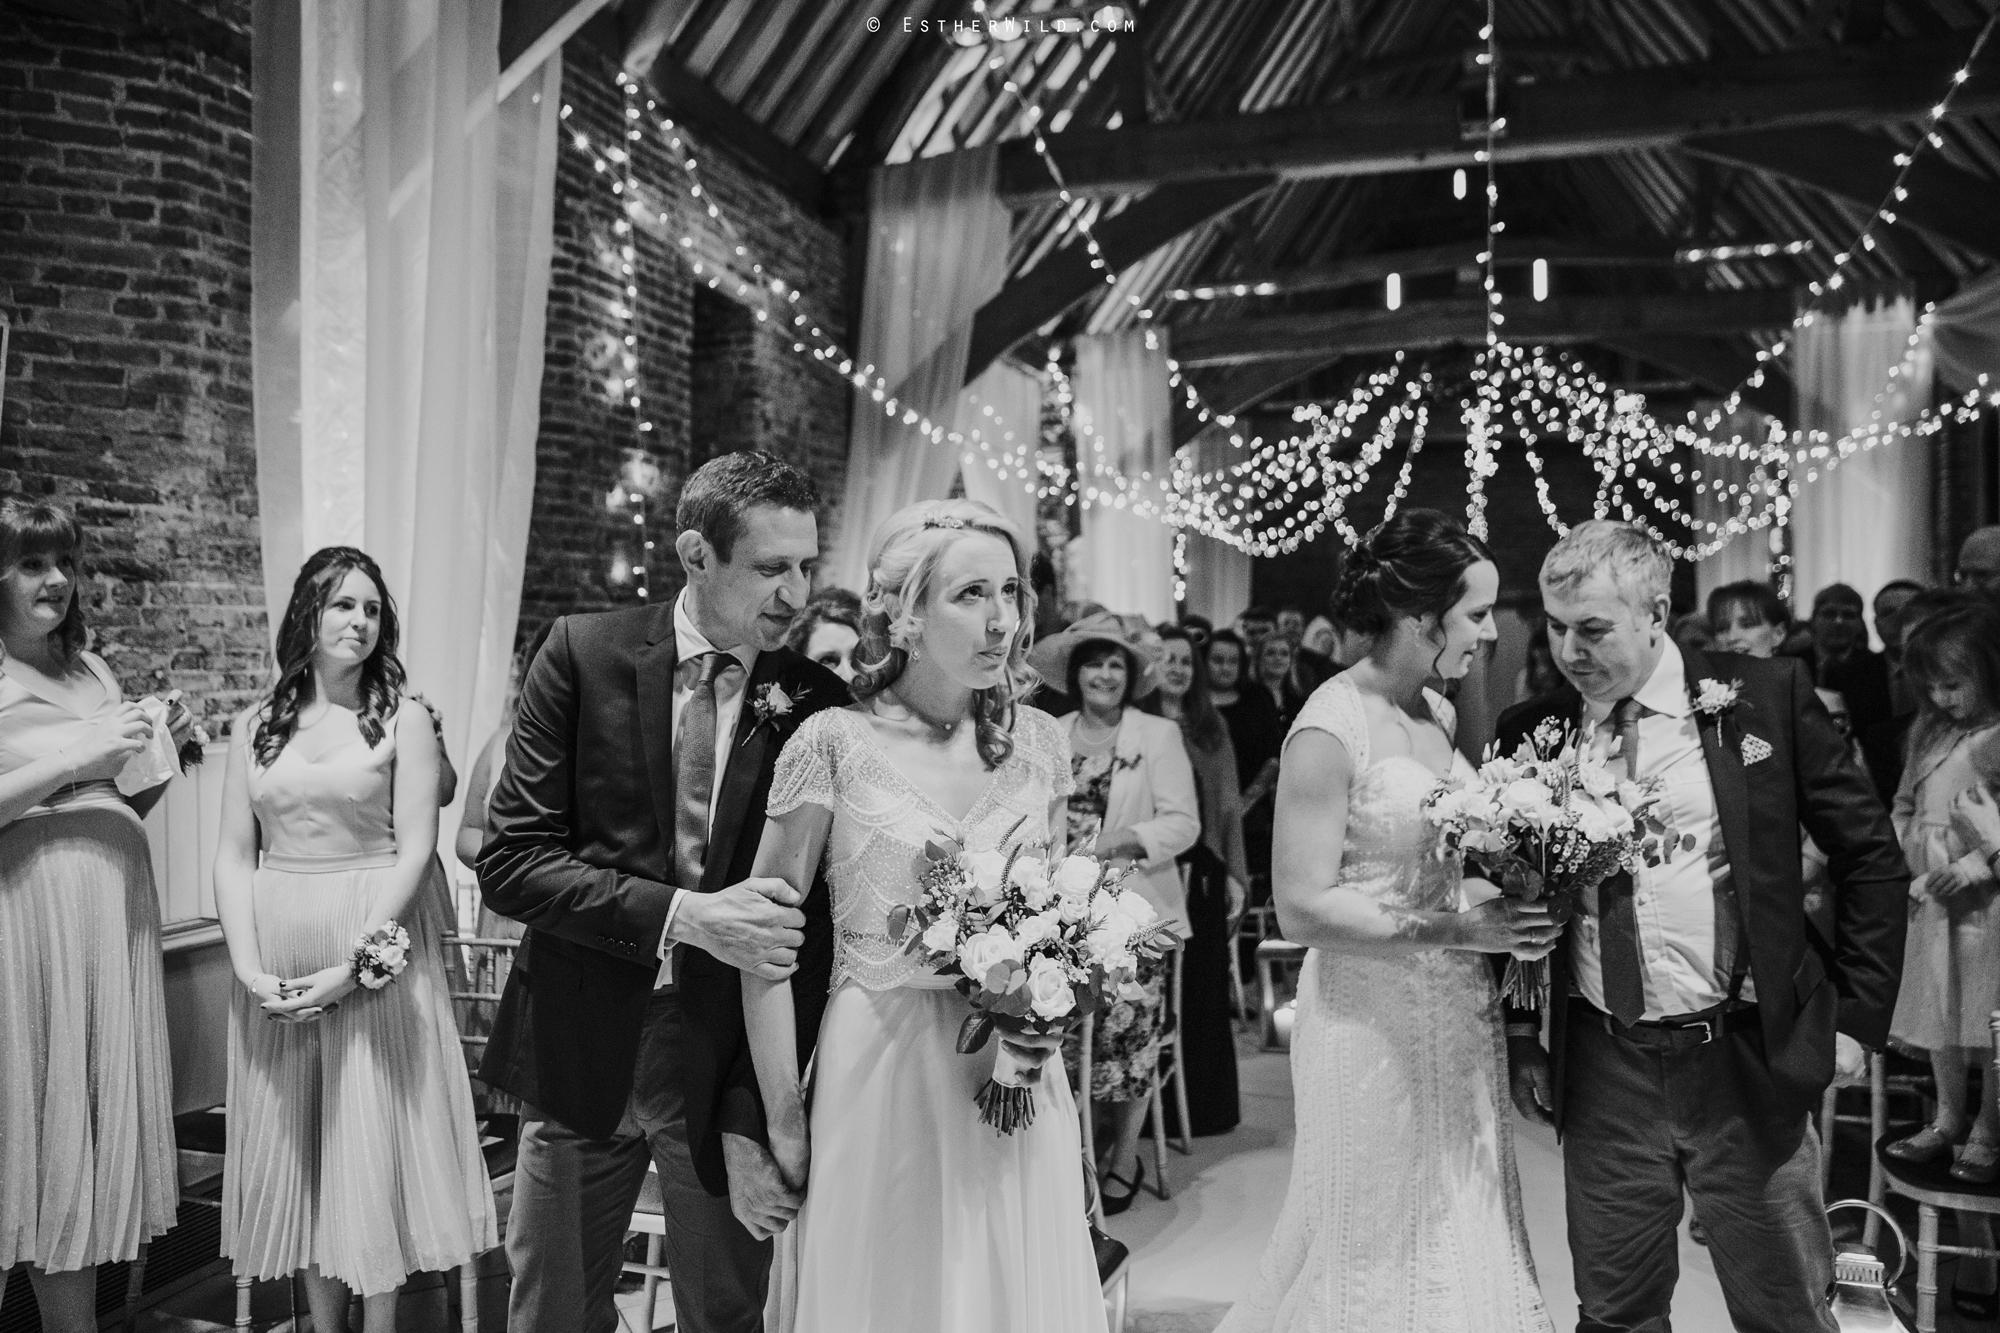 Elms_Barn_Weddings_Suffolk_Photographer_Copyright_Esther_Wild_IMG_1142-2.jpg